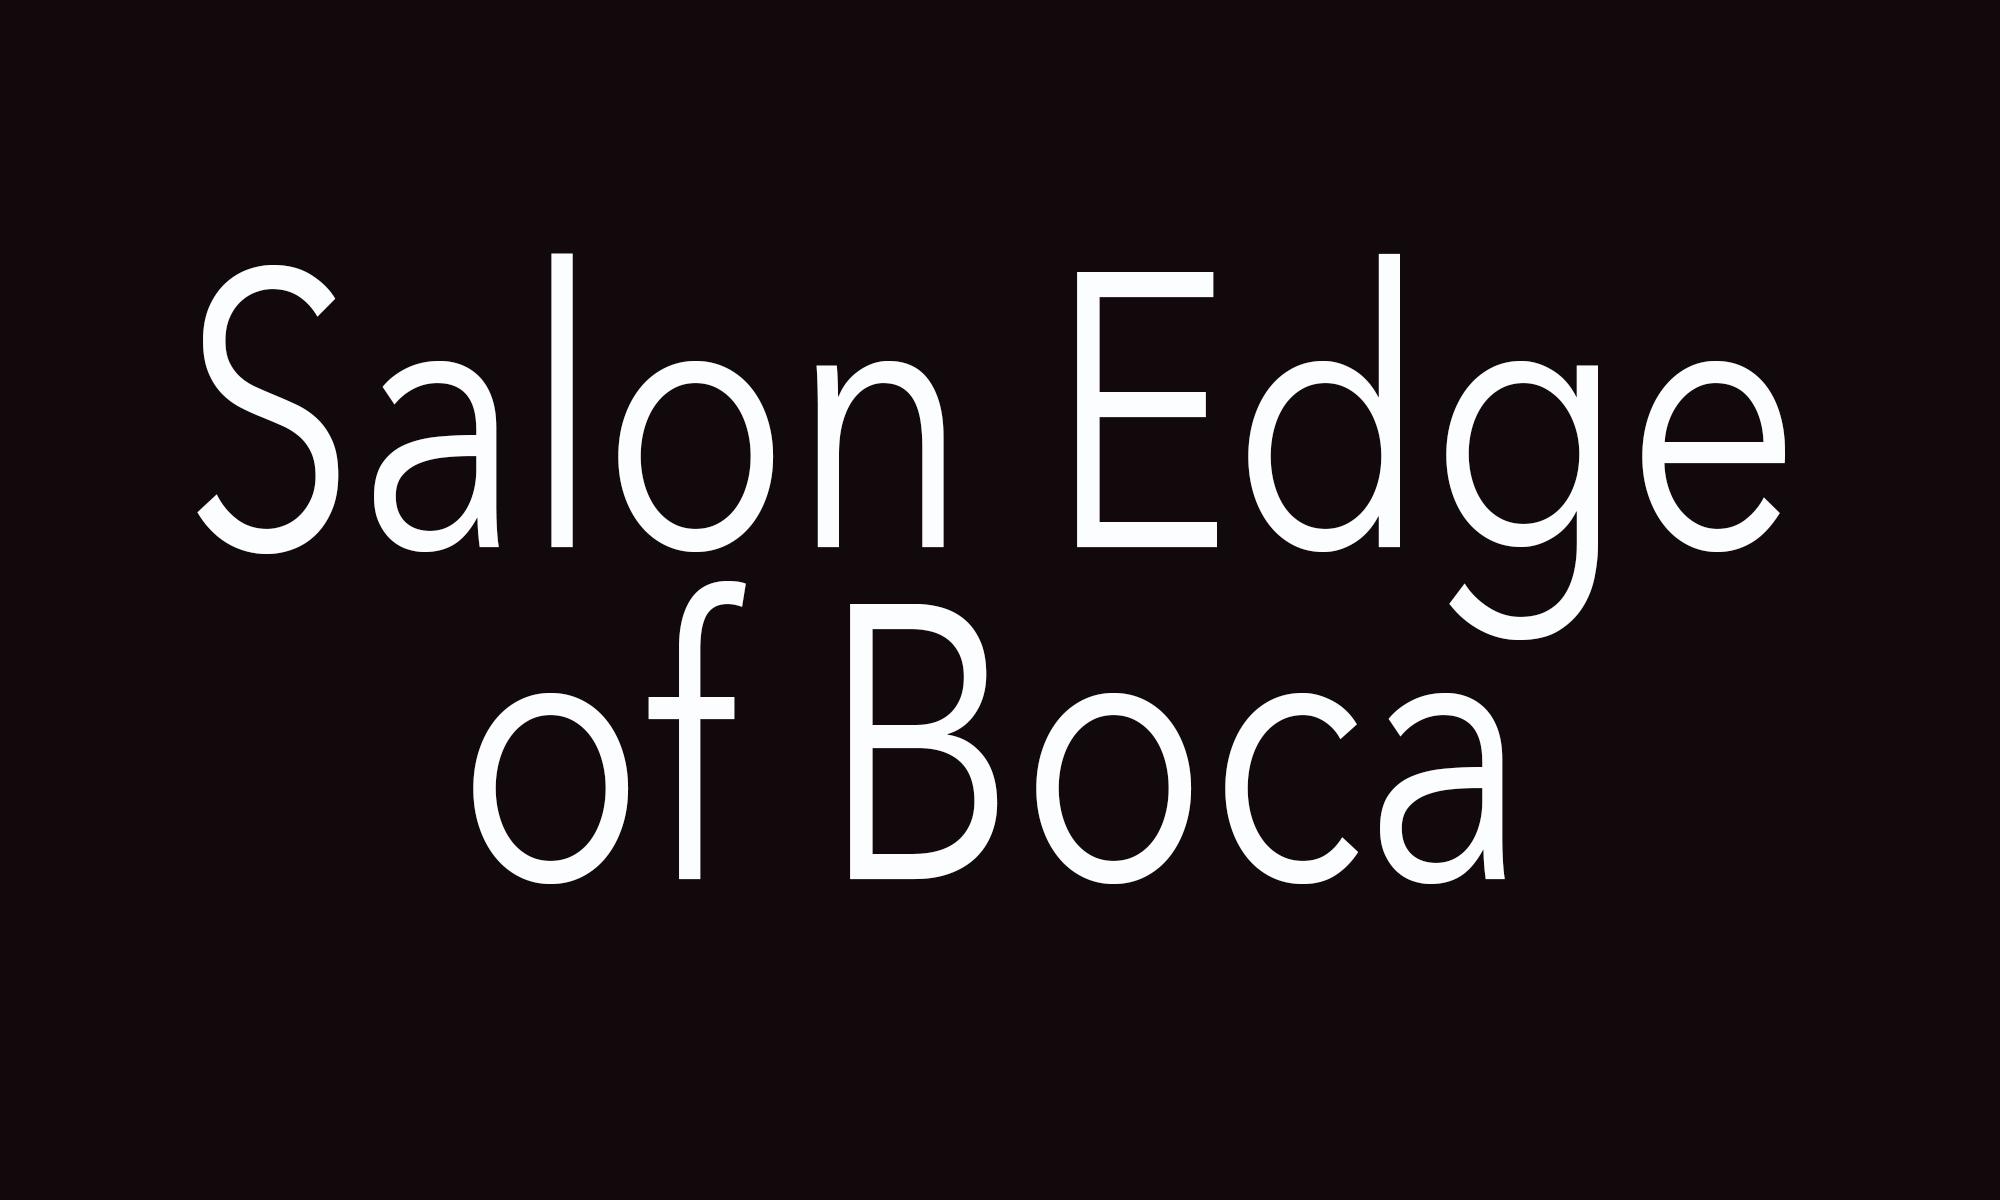 Salon Edge of Boca